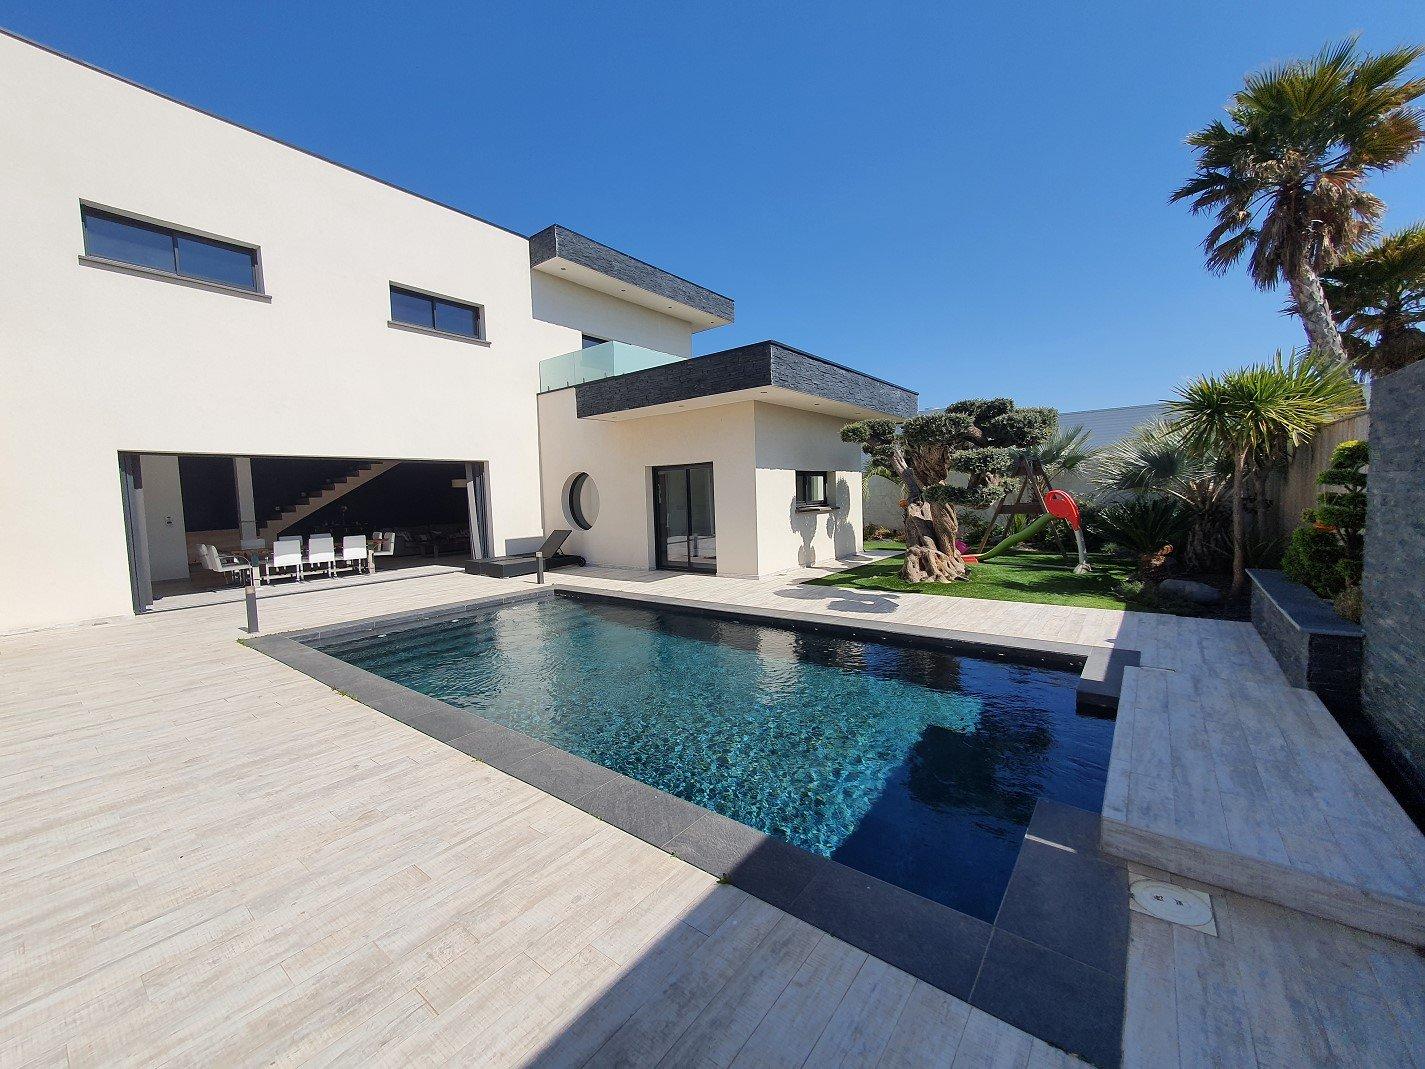 Villa contemporaine avec piscine